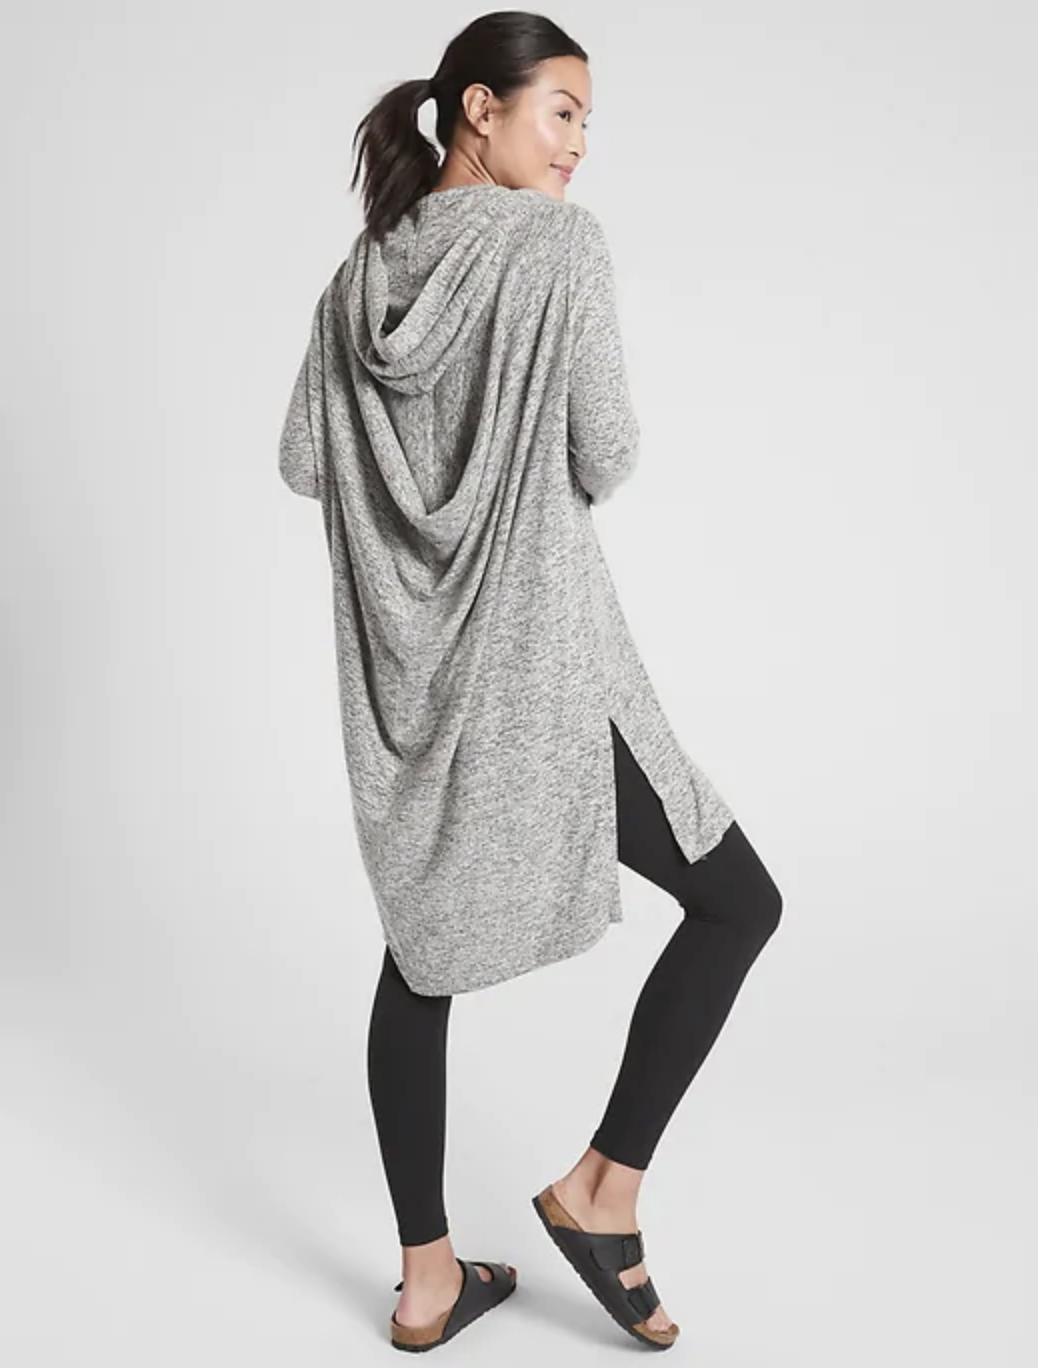 Fall Fashion Must Haves kellyelko.com #fall #fallfashion #fallclothes #athleisure #ootd